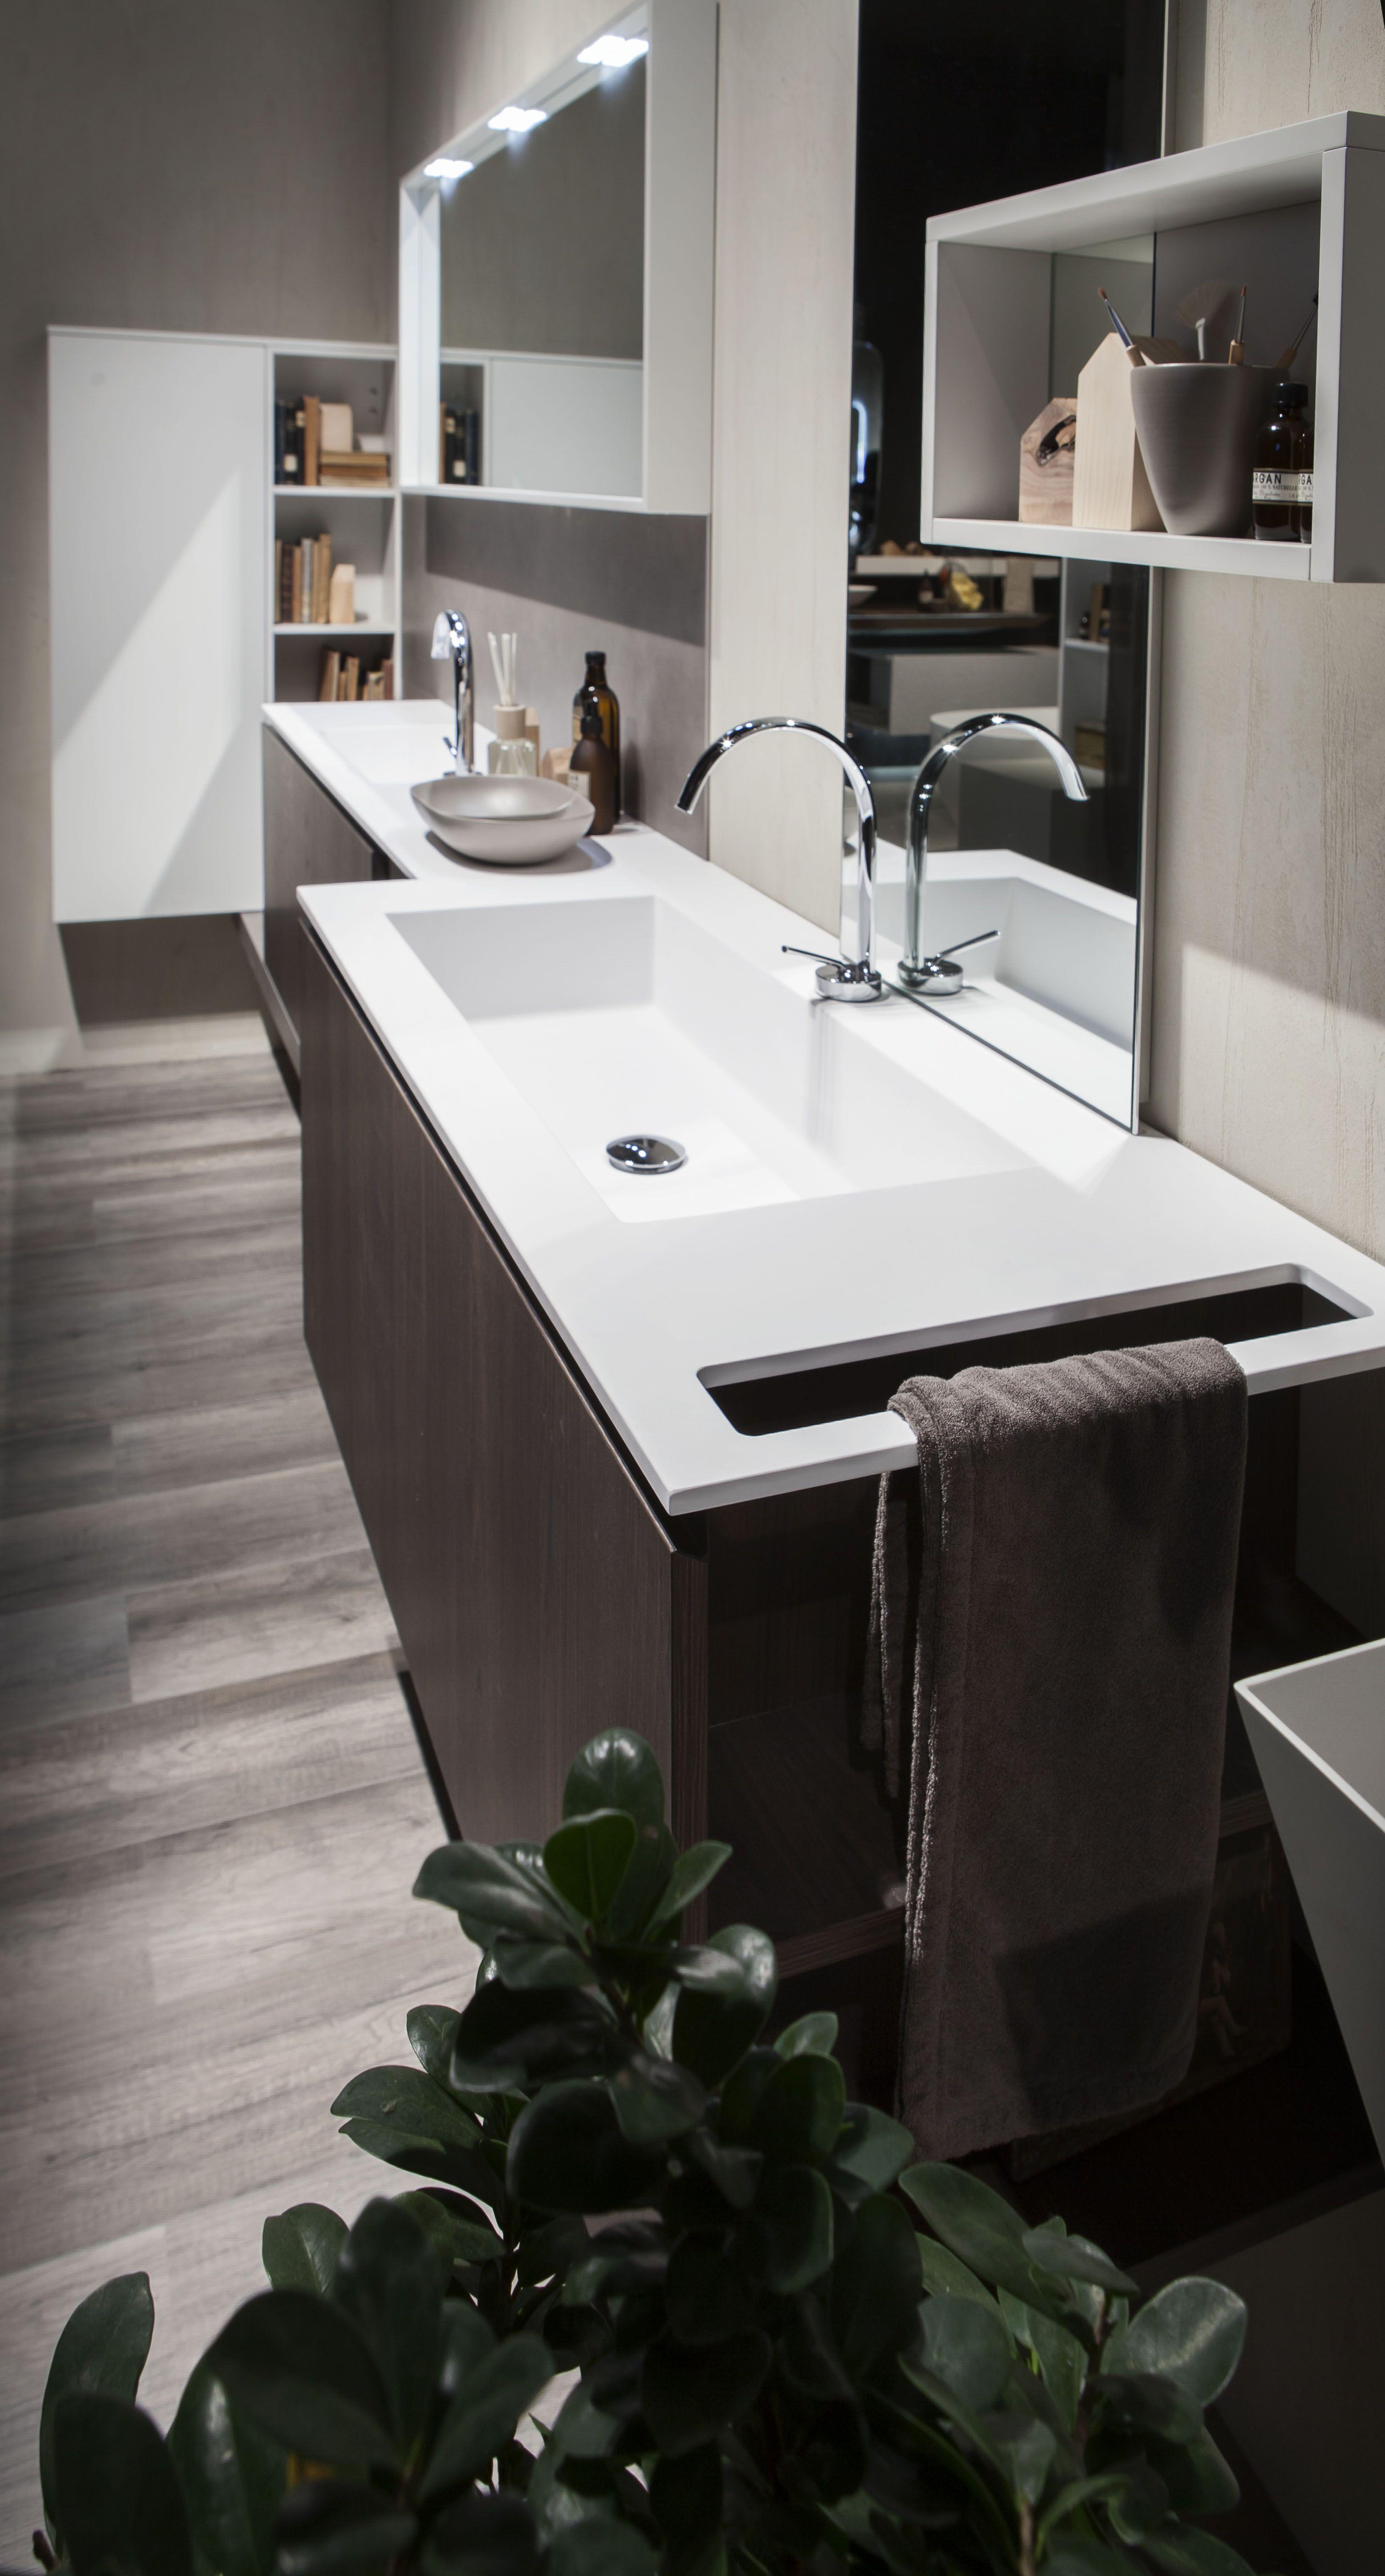 dettagli novit salonebagno 2014 meuble de salle de bain pinterest salle de bain meuble. Black Bedroom Furniture Sets. Home Design Ideas